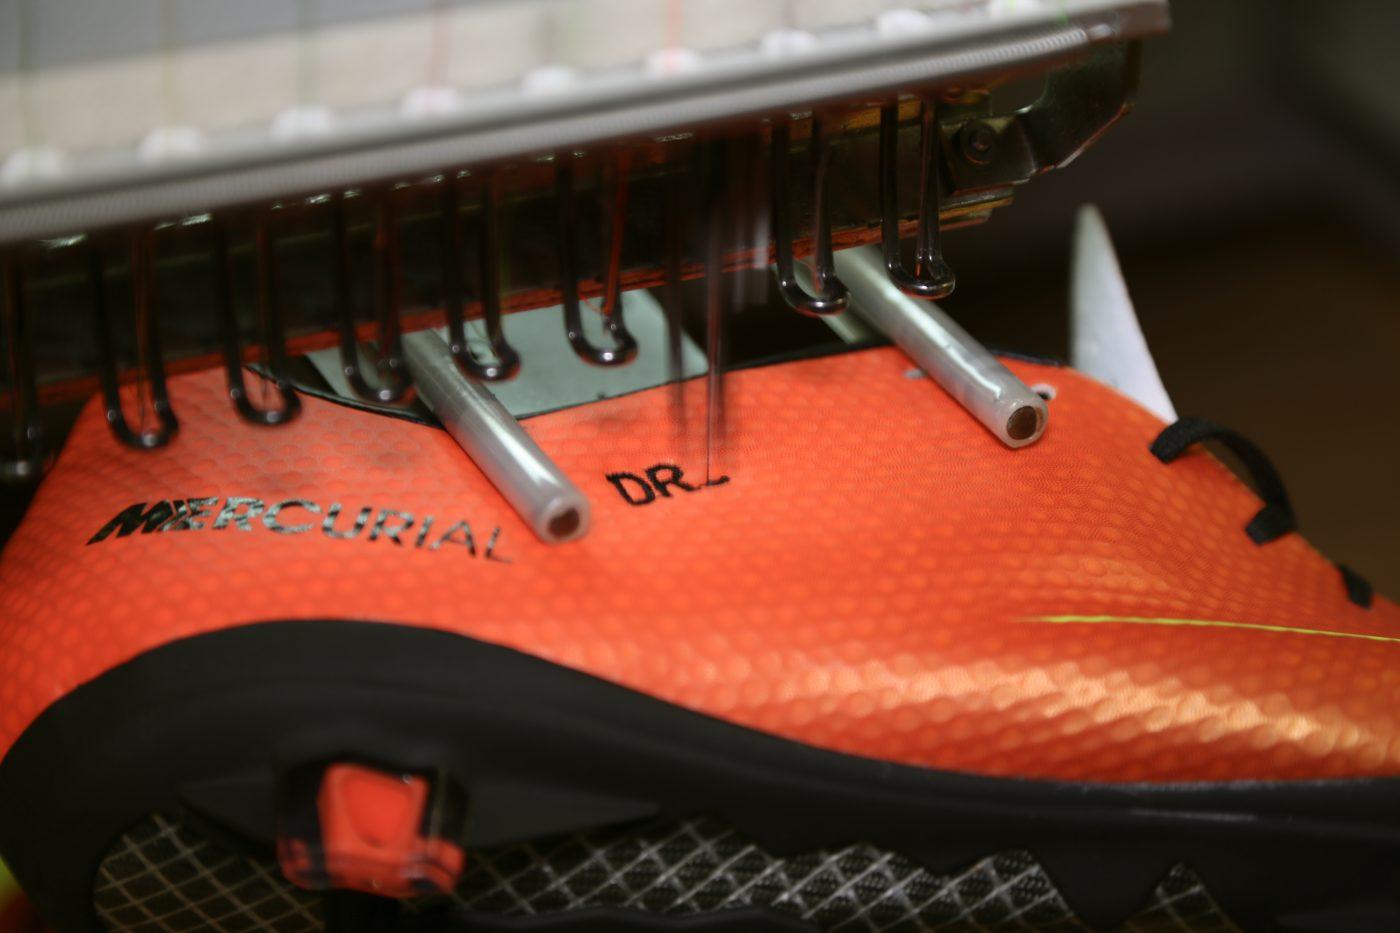 low priced bcb25 5ddc7 ... didier-drogba-chaussures-nike-les-chaussures-de-didier- ...